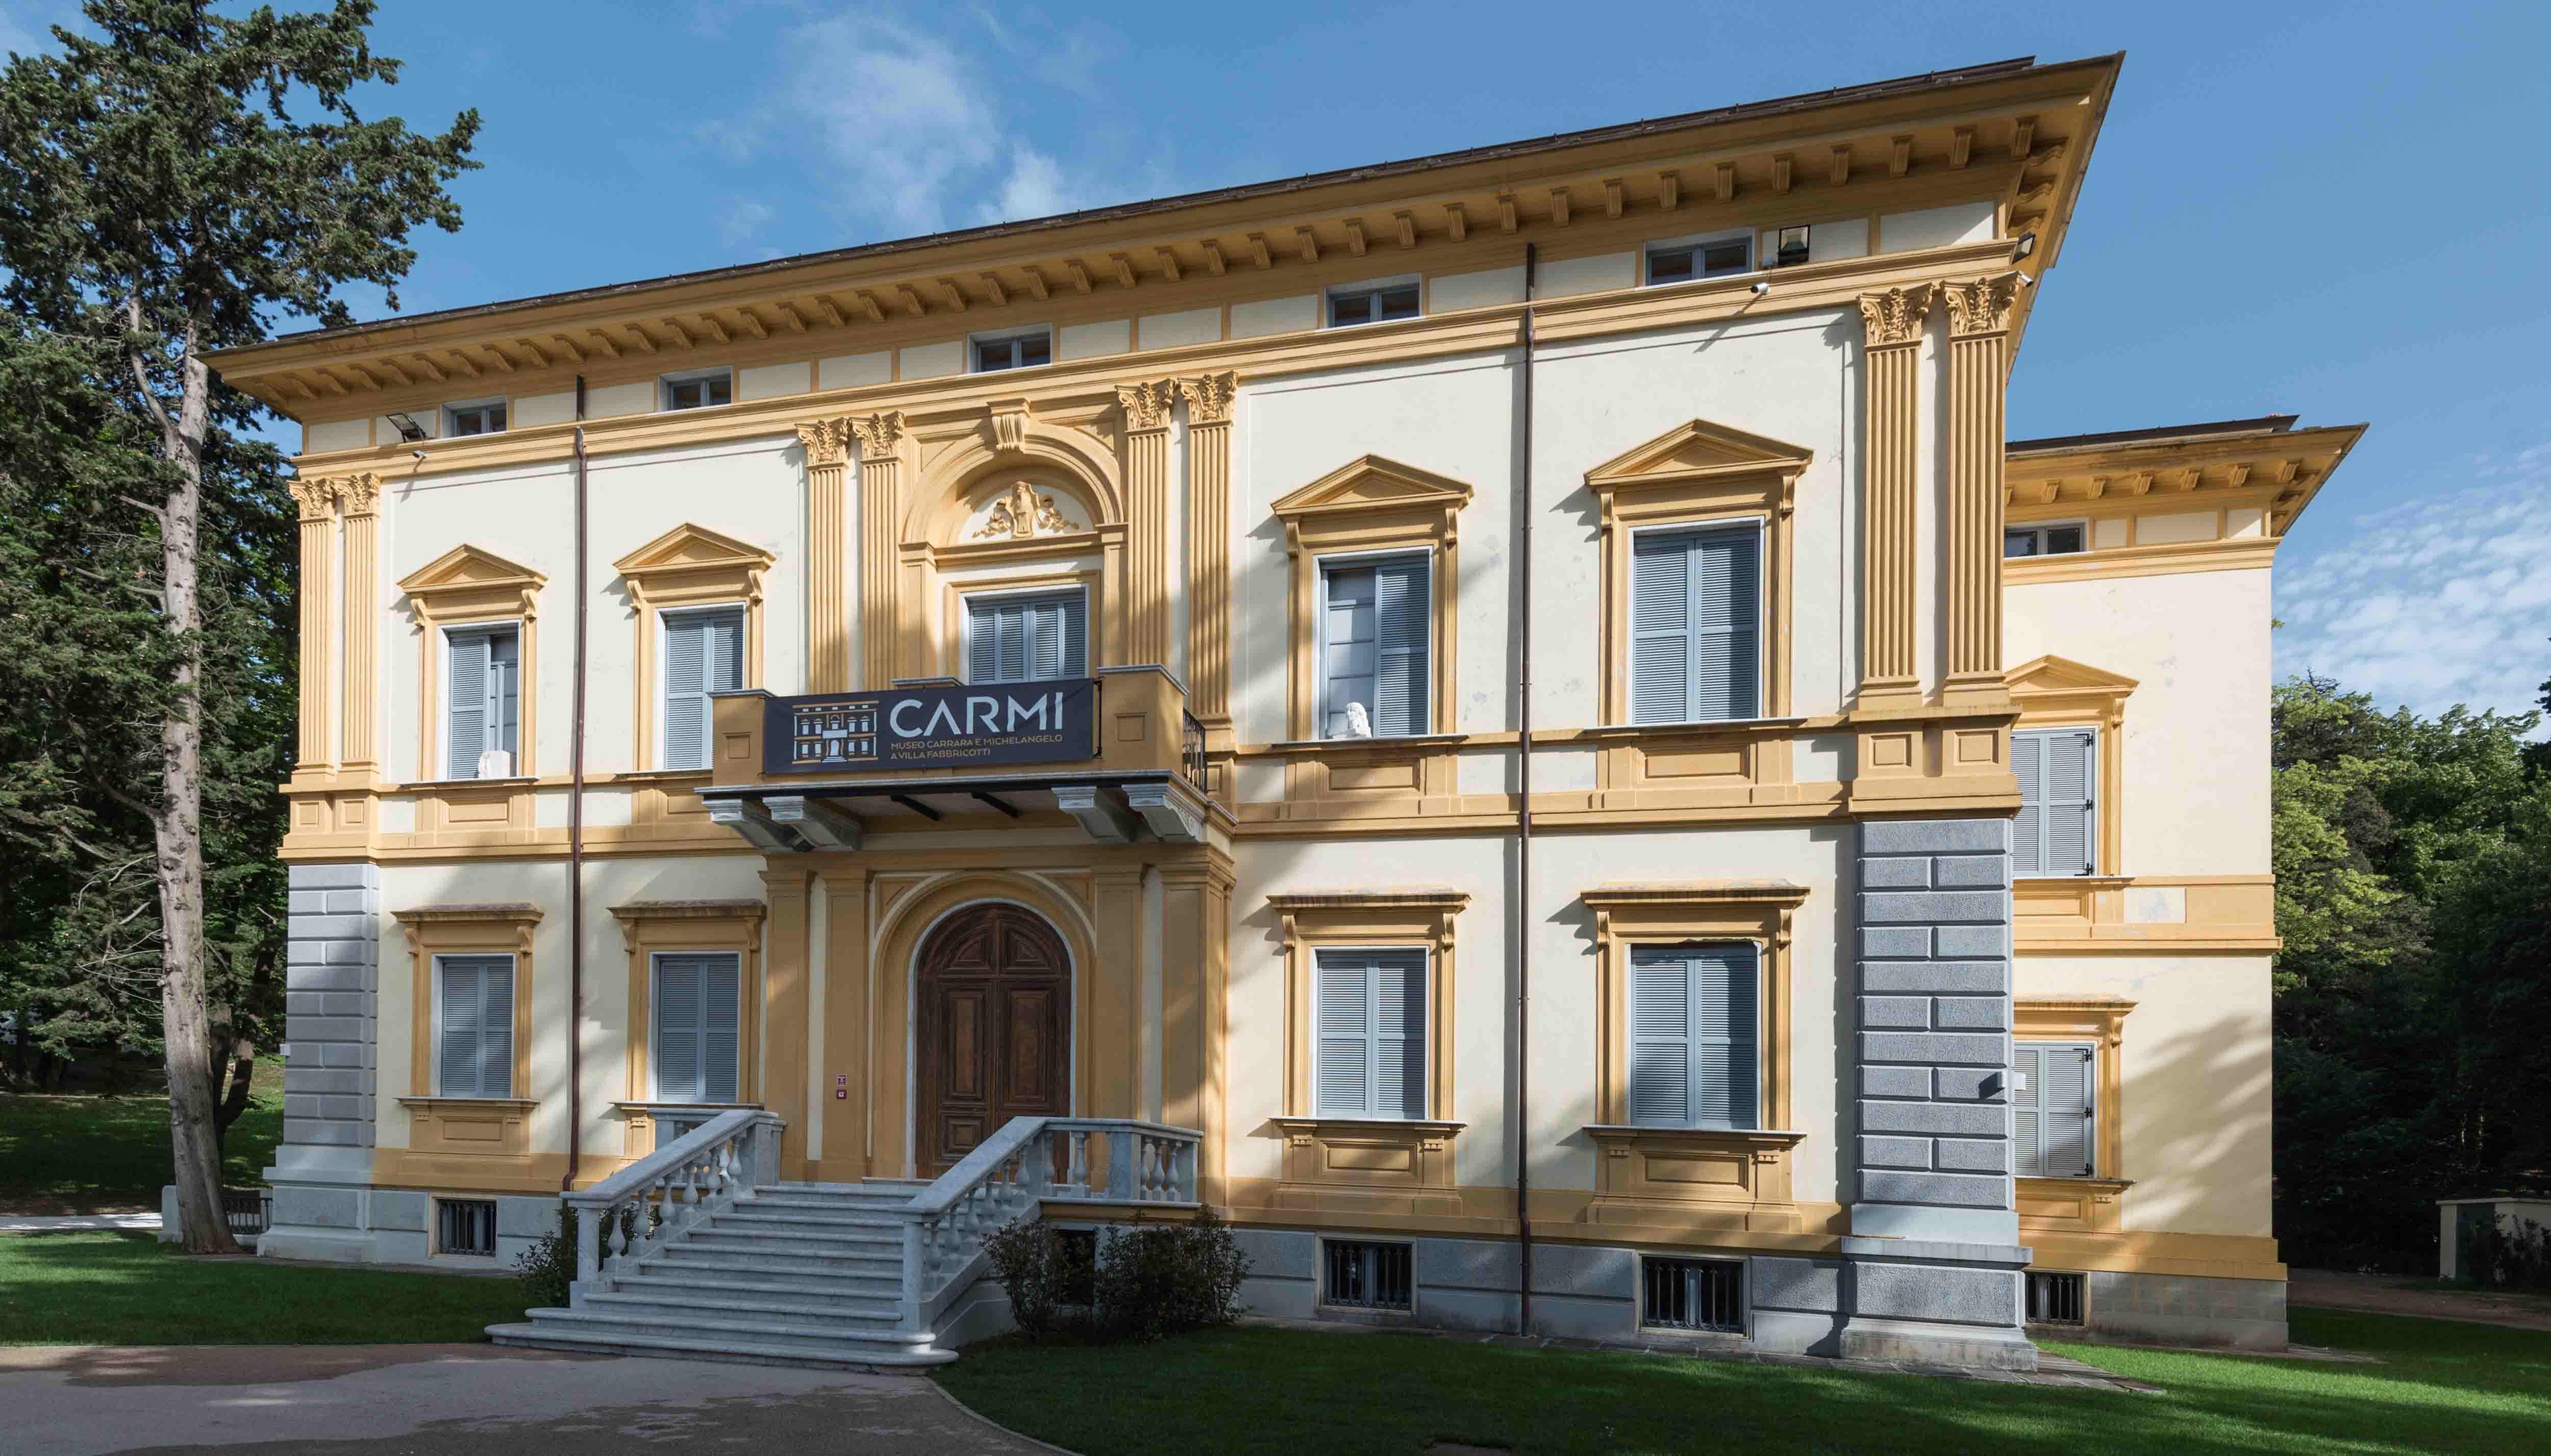 Comune di Carrara – Museo Carmi